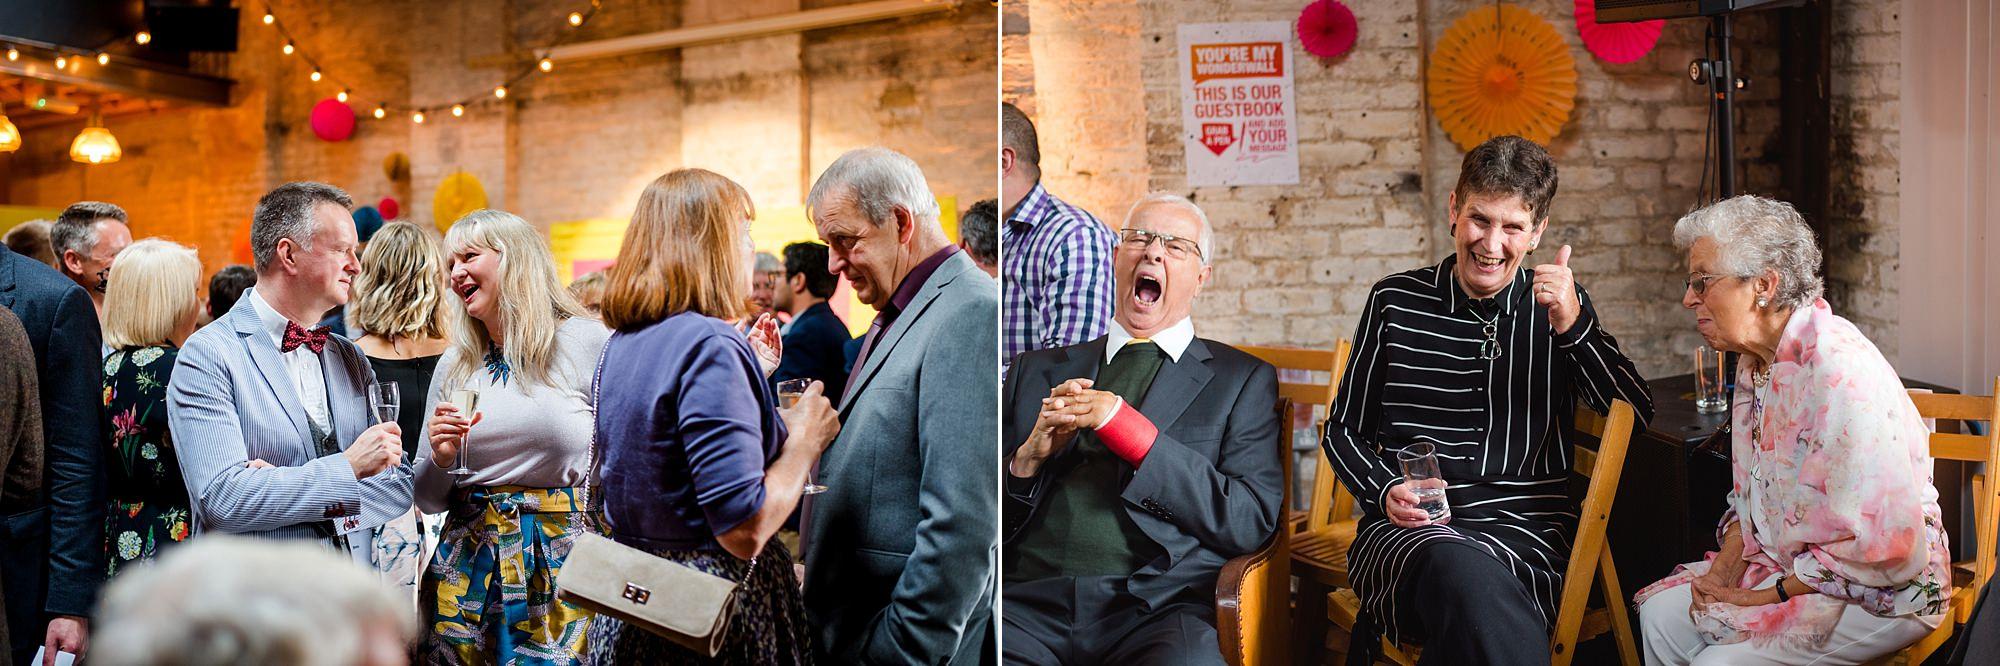 Fun London Wedding guests enjoying drinks reception